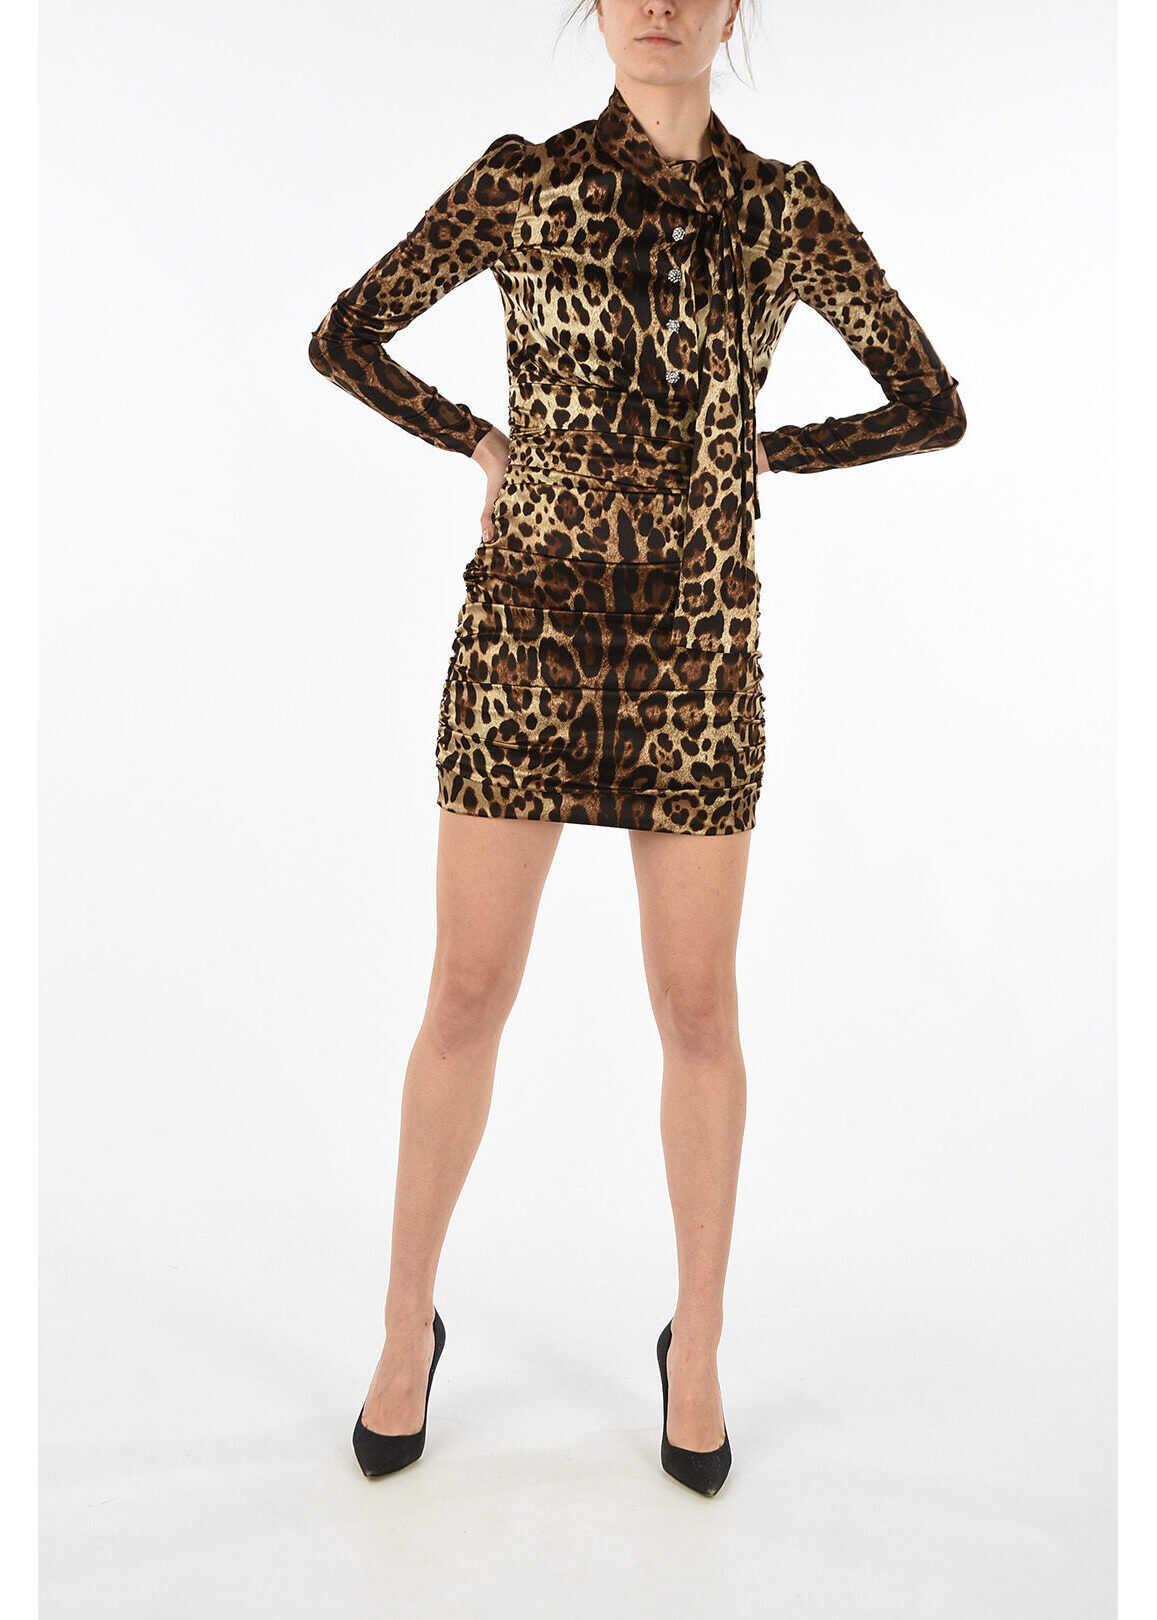 Dolce & Gabbana long sleeve leopard-print sheath dress BROWN